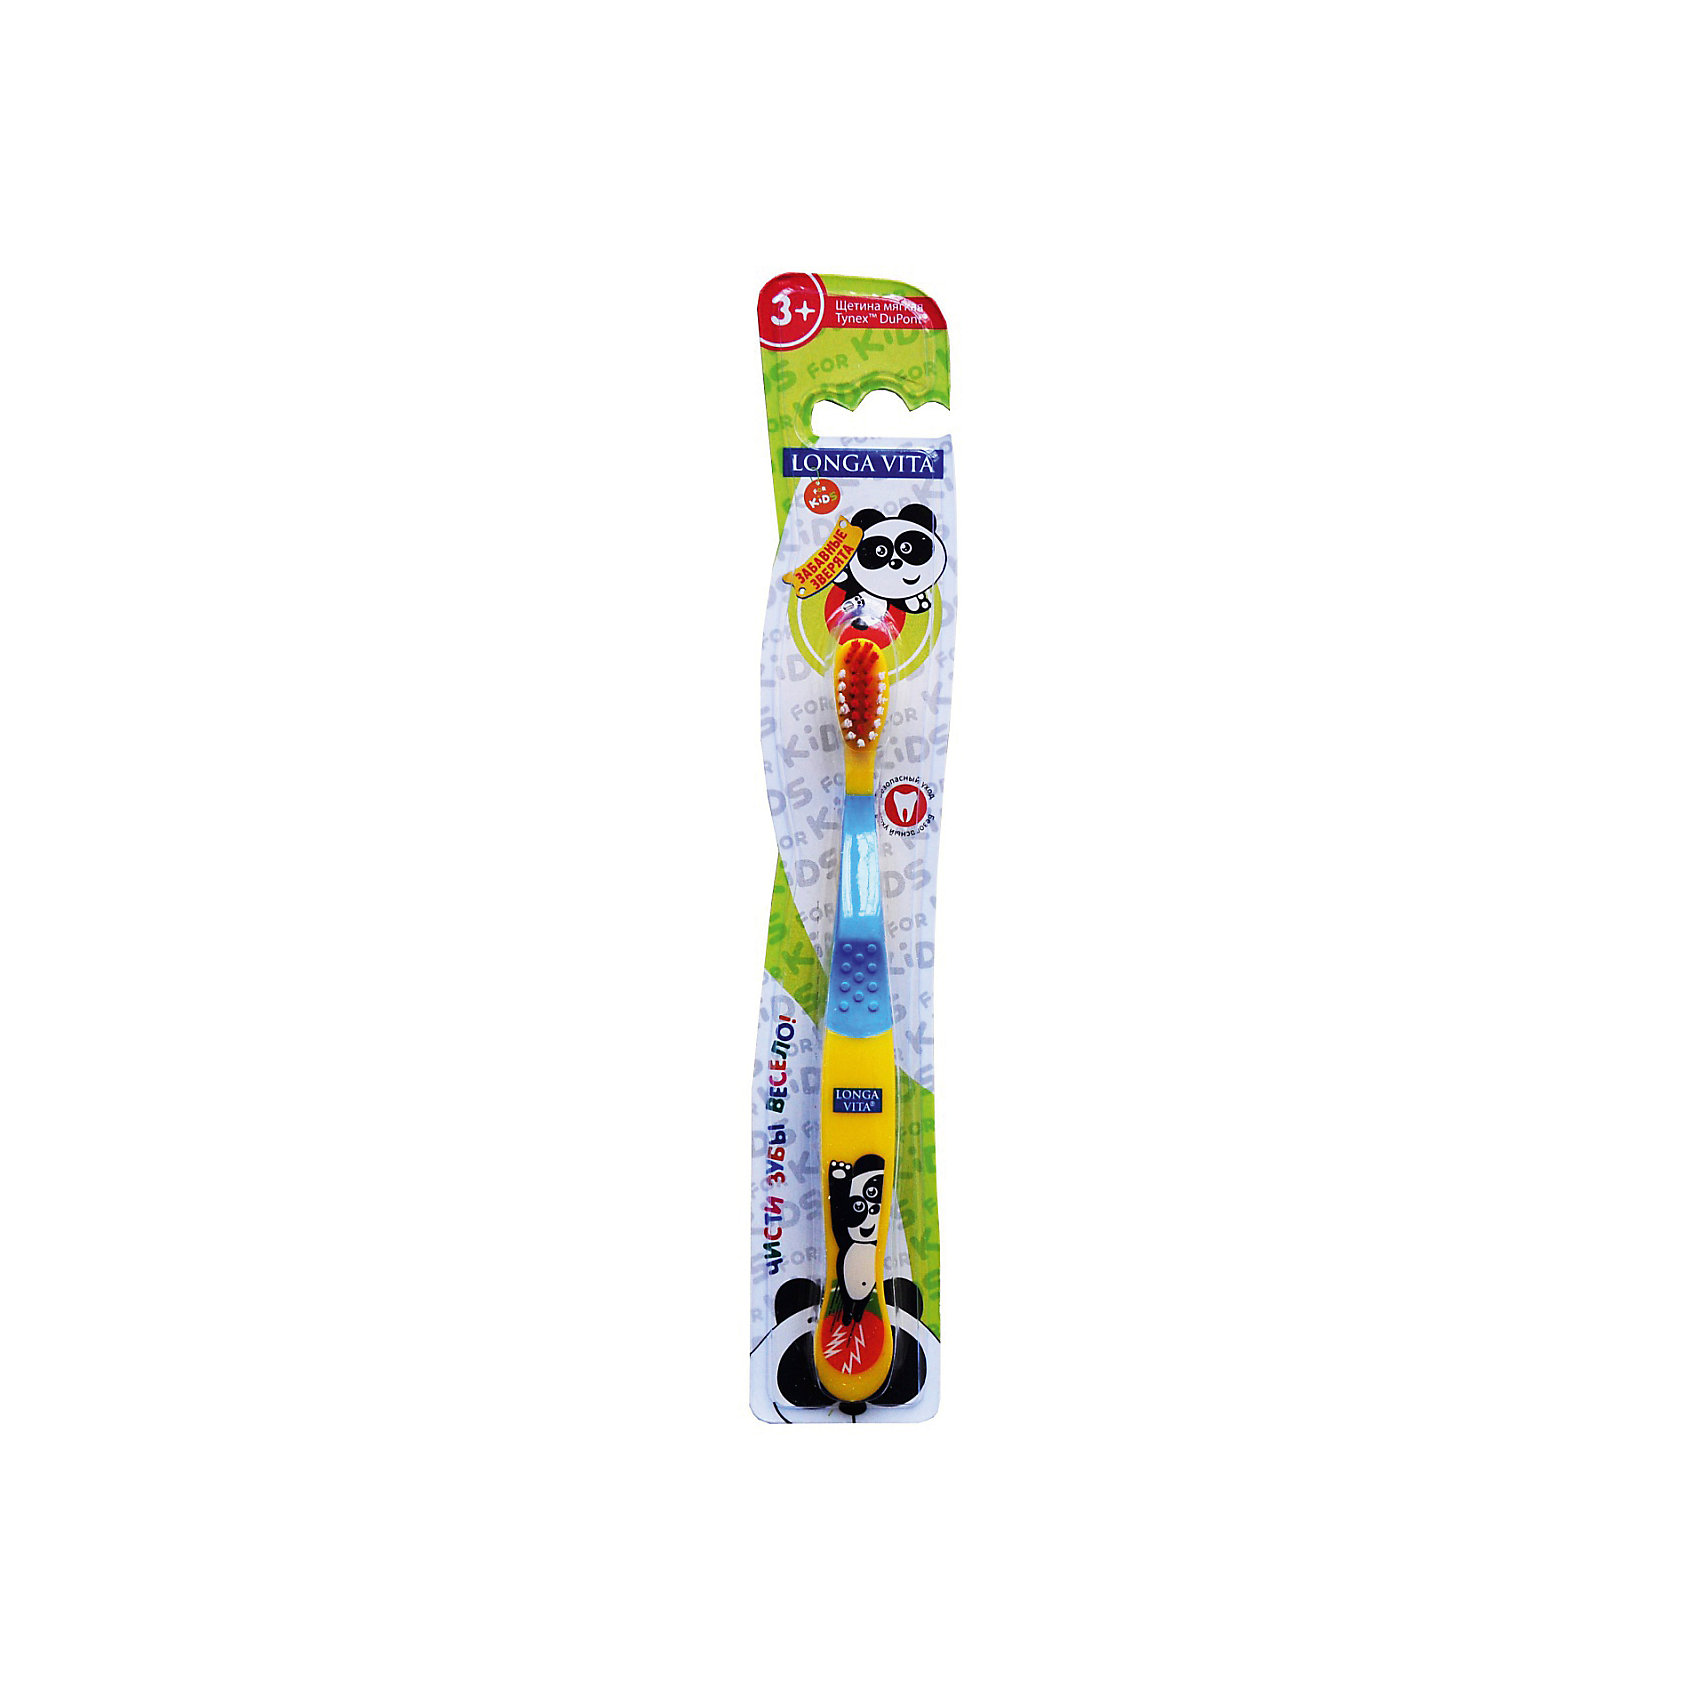 Детская зубная щетка Забавные зверята, от 3-х лет, арт. S-138, LONGA VITA, желтый